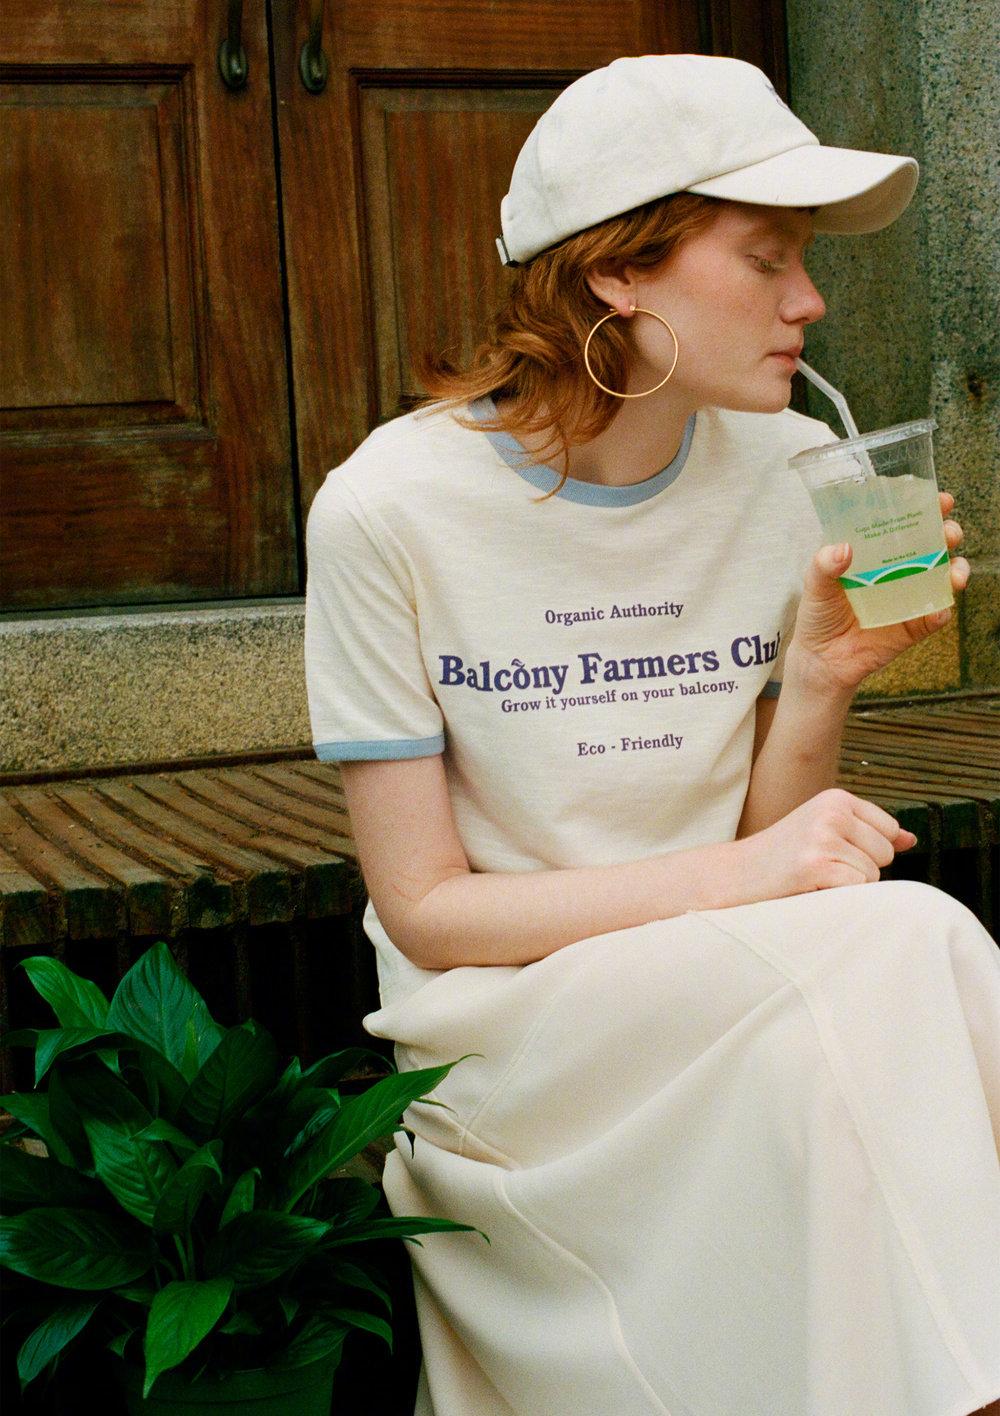 Balcony Farmers Club